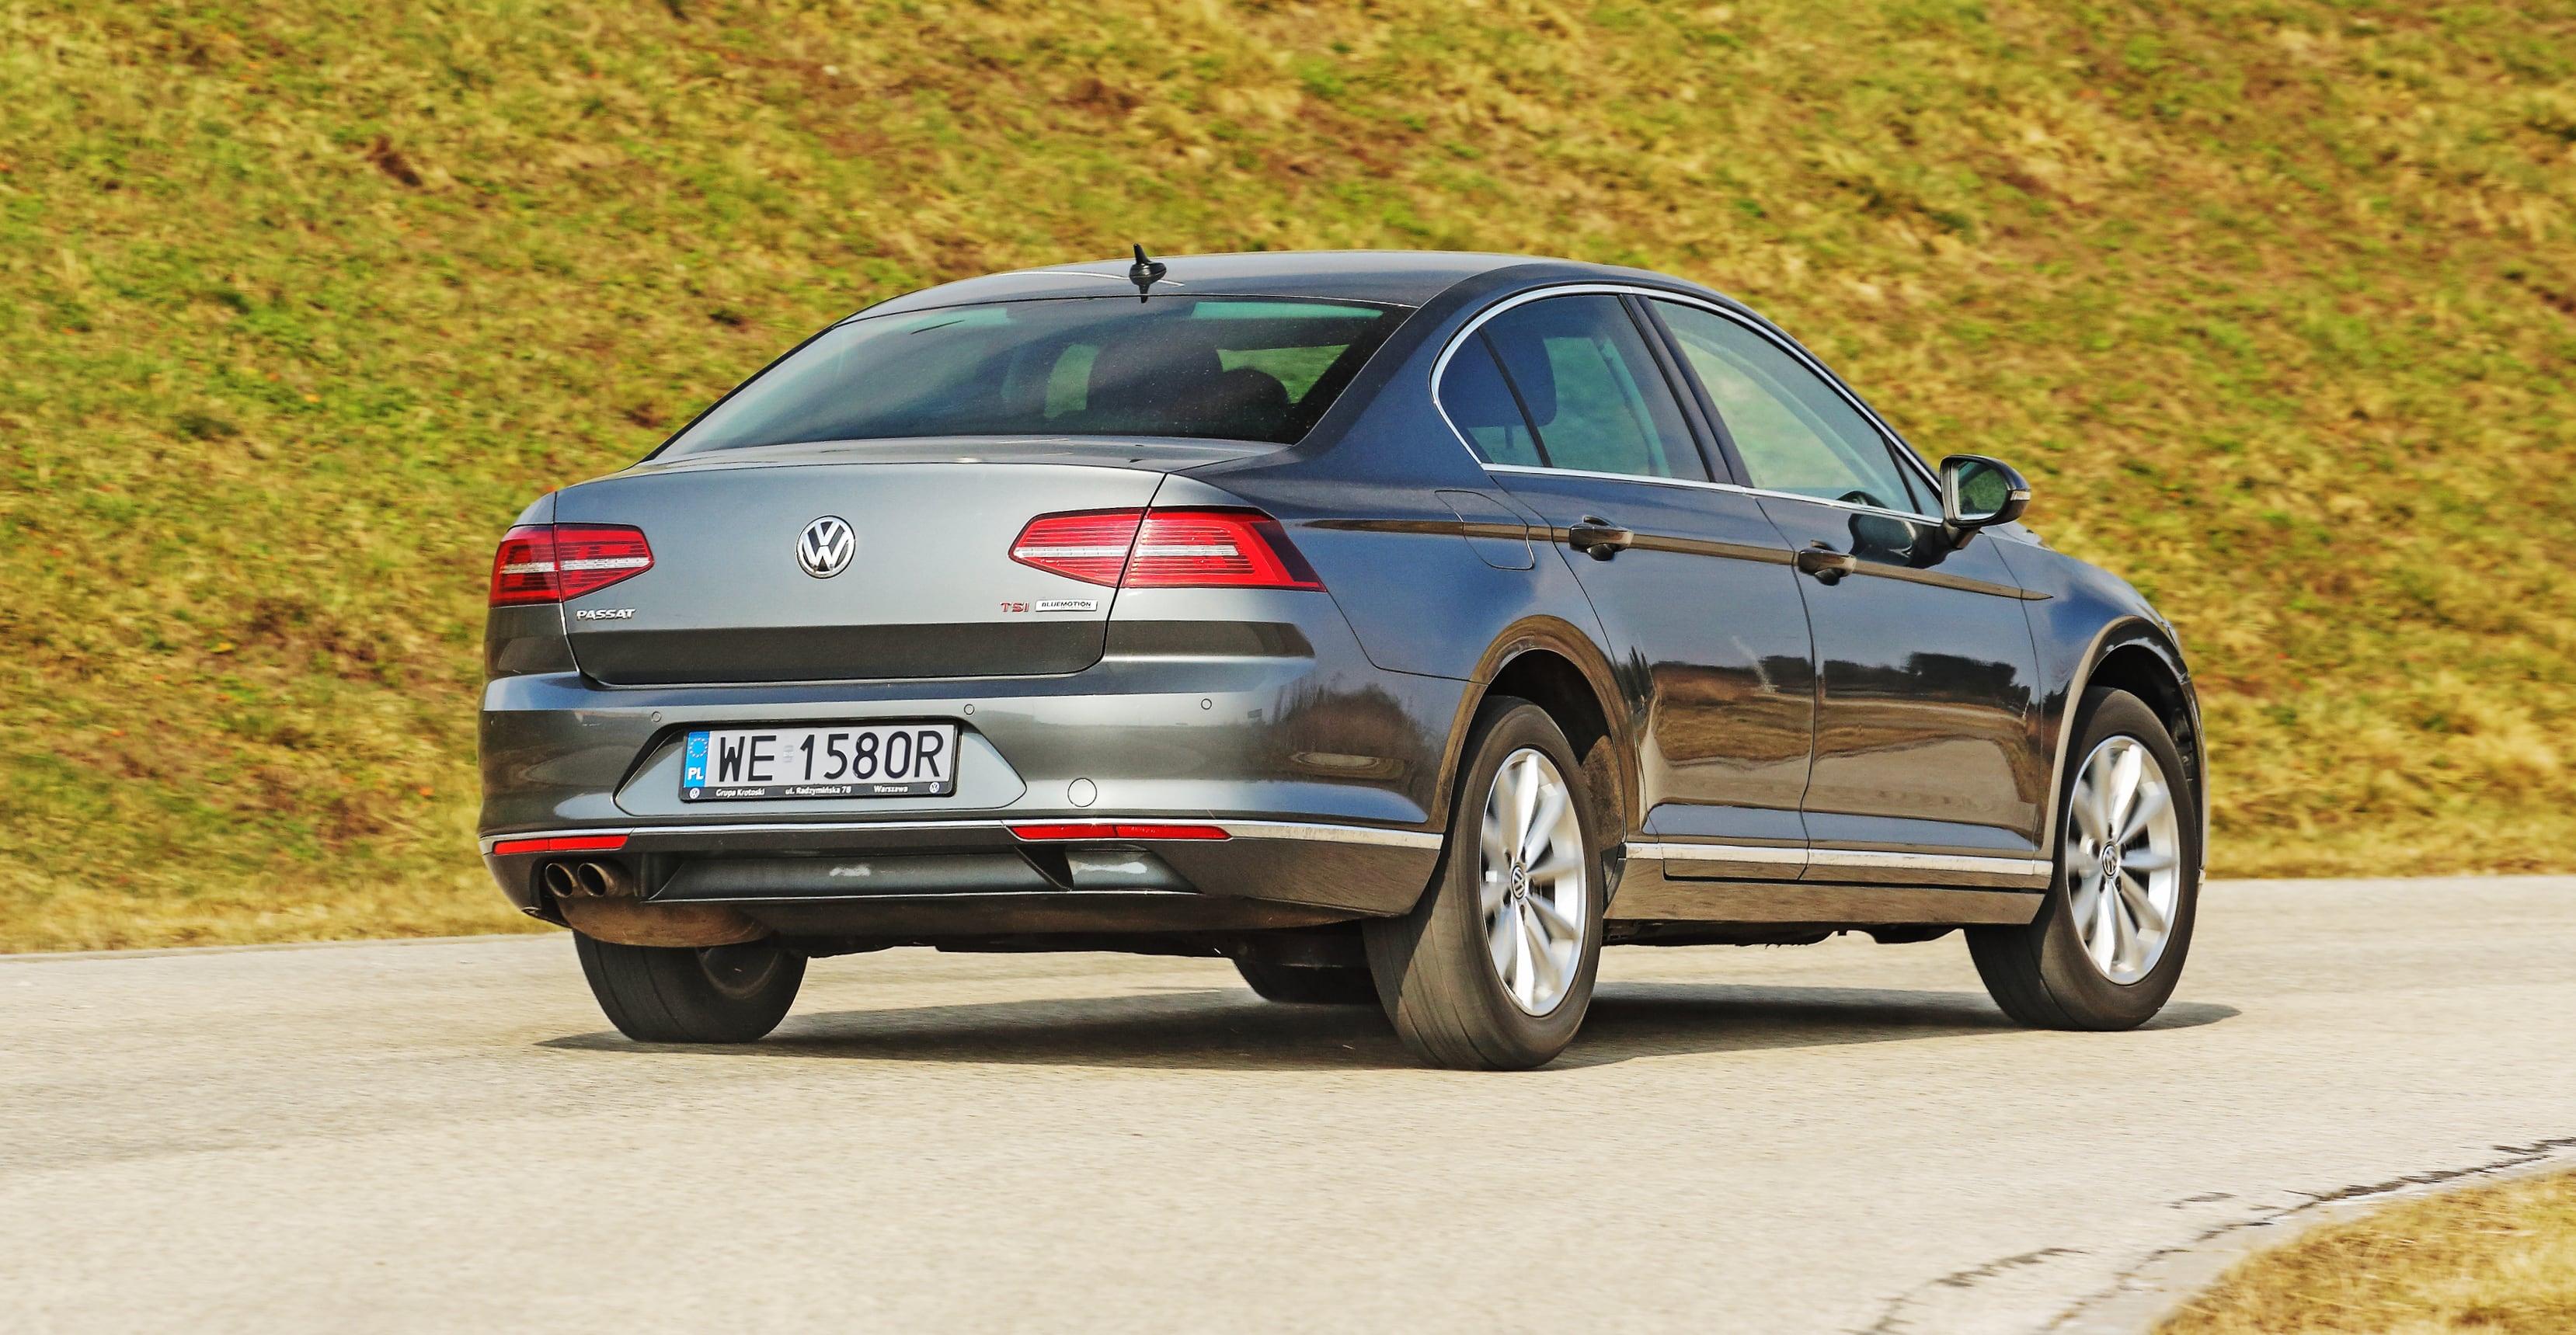 Volkswagen Passat (B8) 1.8 TSI nazakręcie, tył ibok